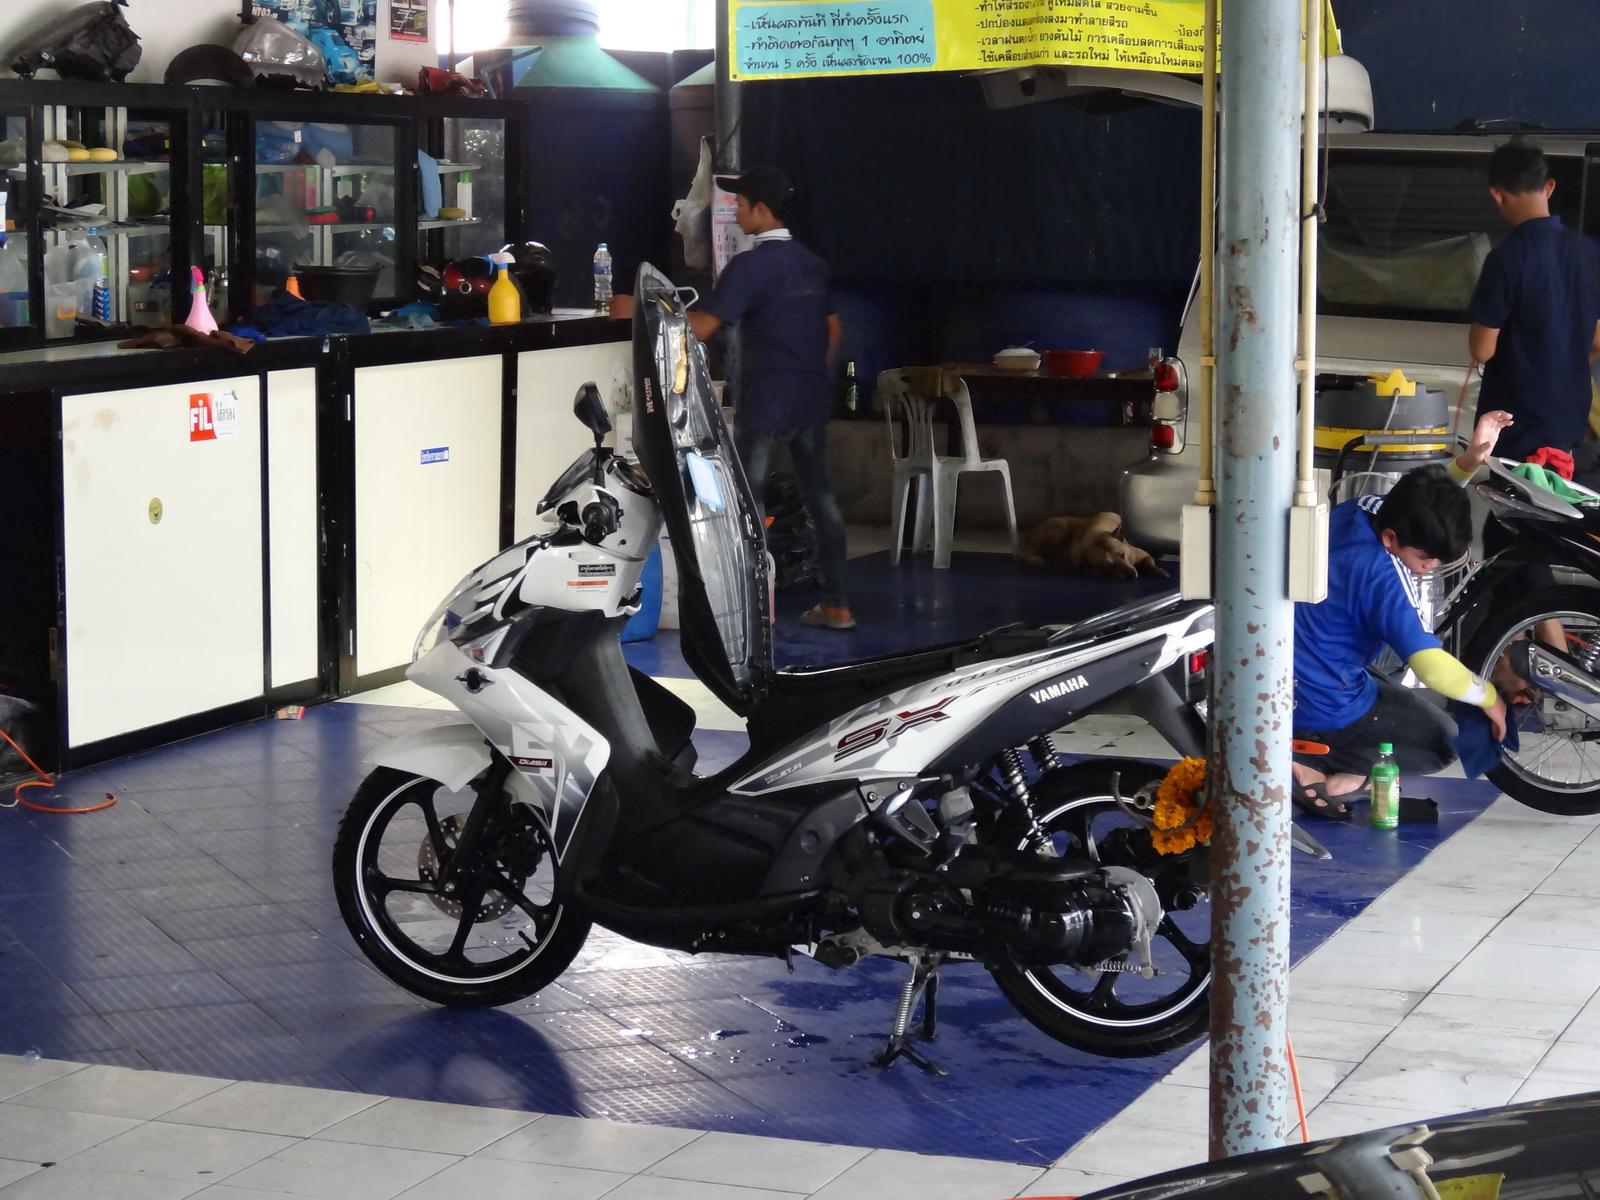 07 Pattaya 084